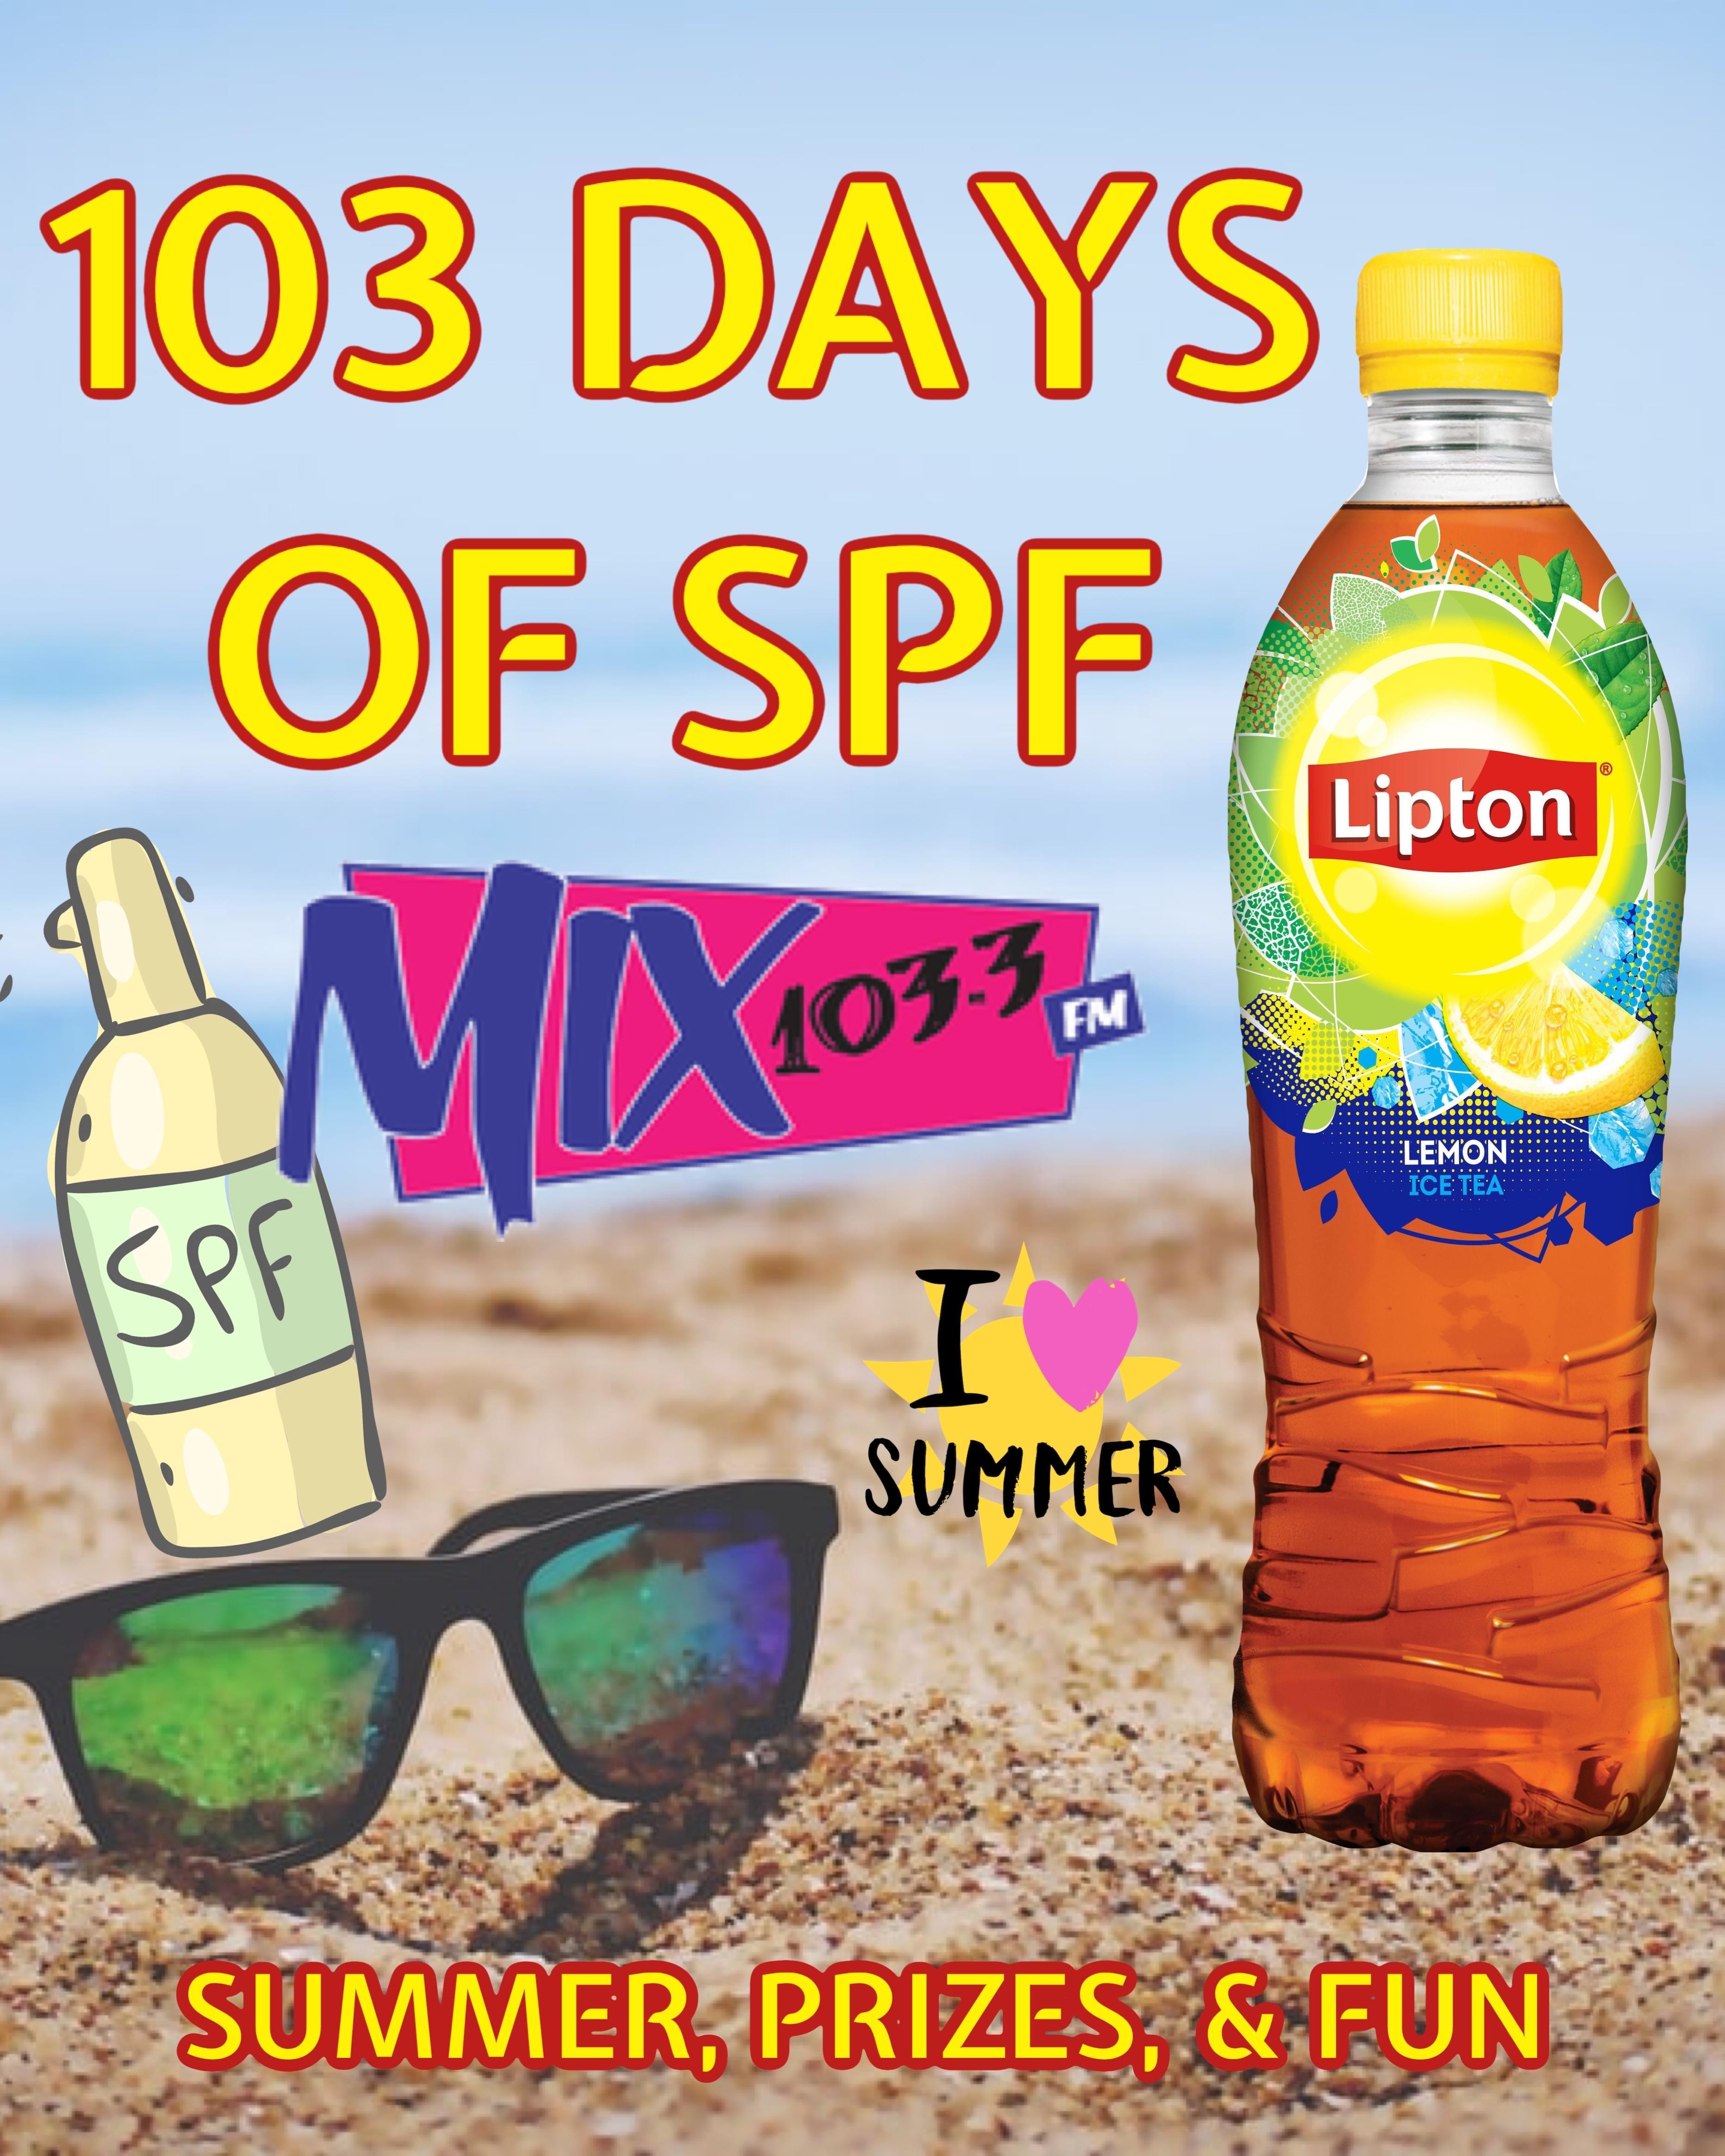 103 Days of SPF with Lipton Tea